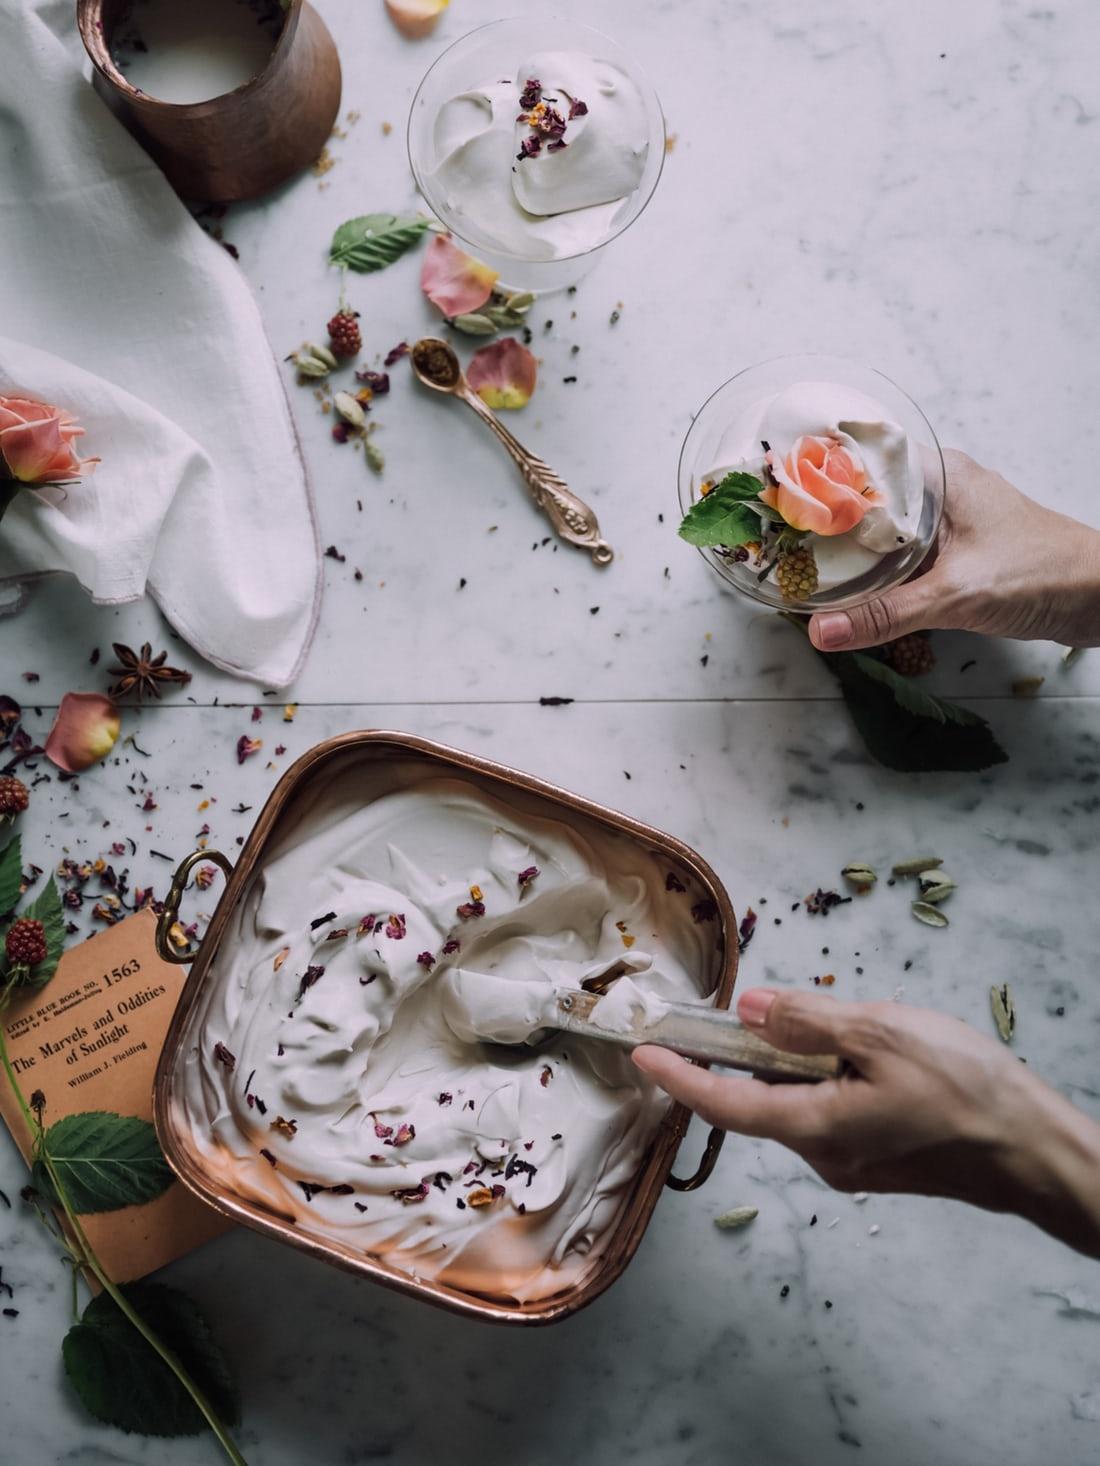 делаем мороженое дома